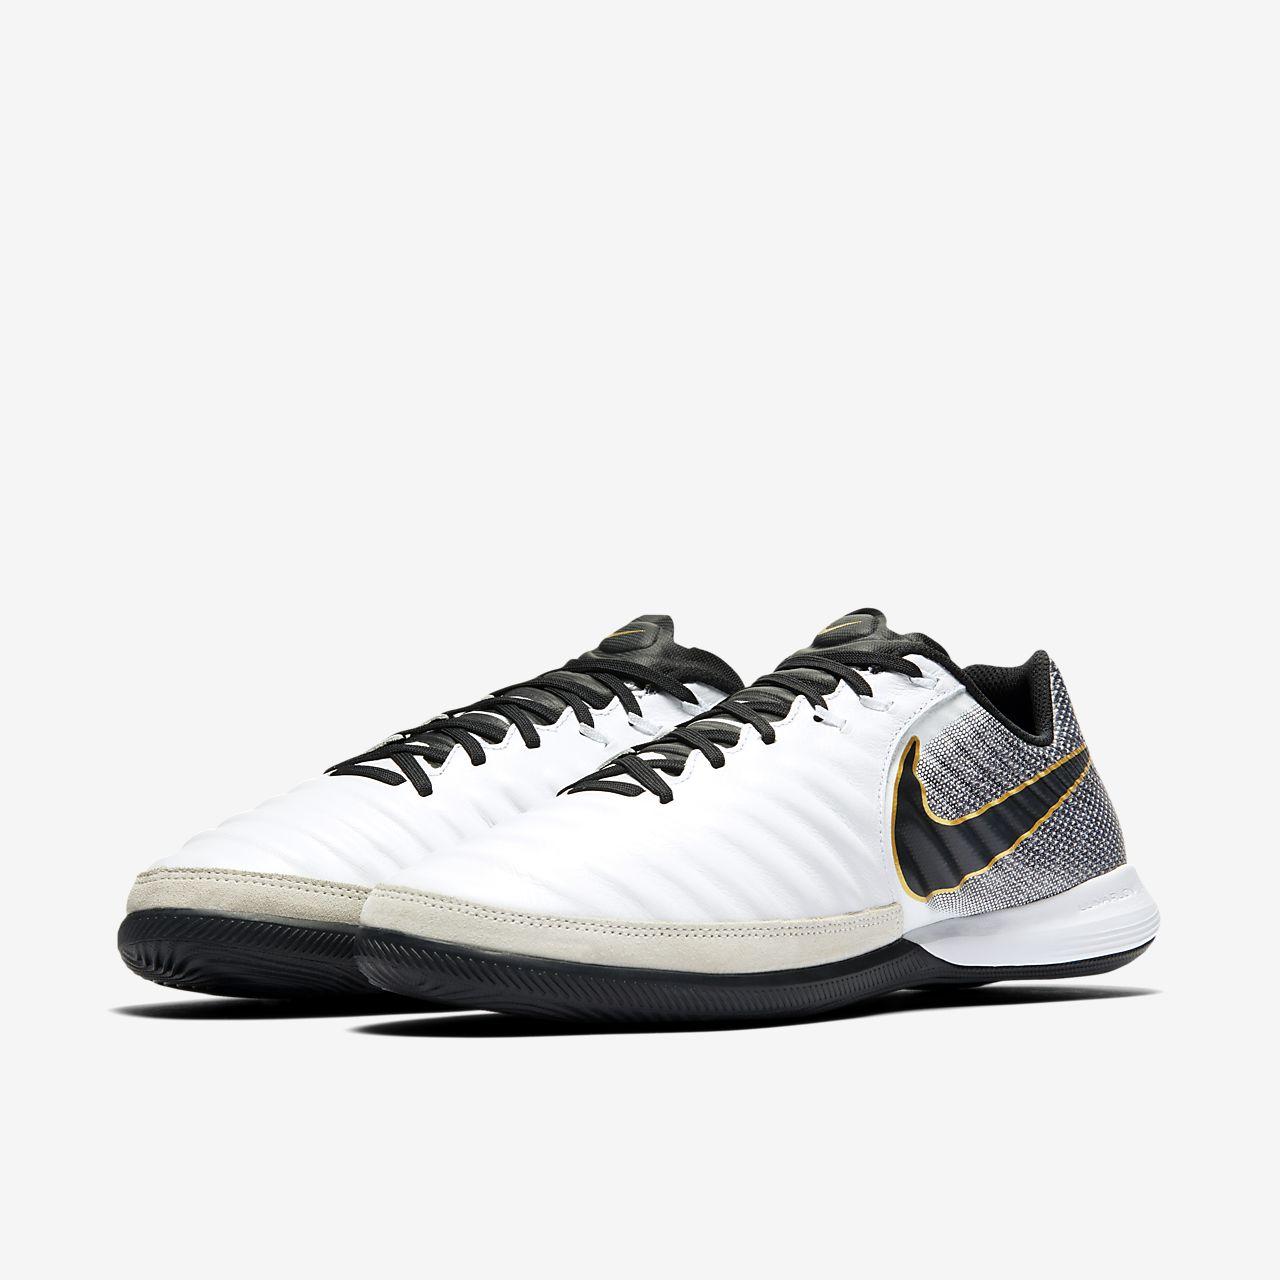 the latest b5c16 f77b5 ... Nike TiempoX Lunar Legend VII Pro Indoor Court Football Shoe